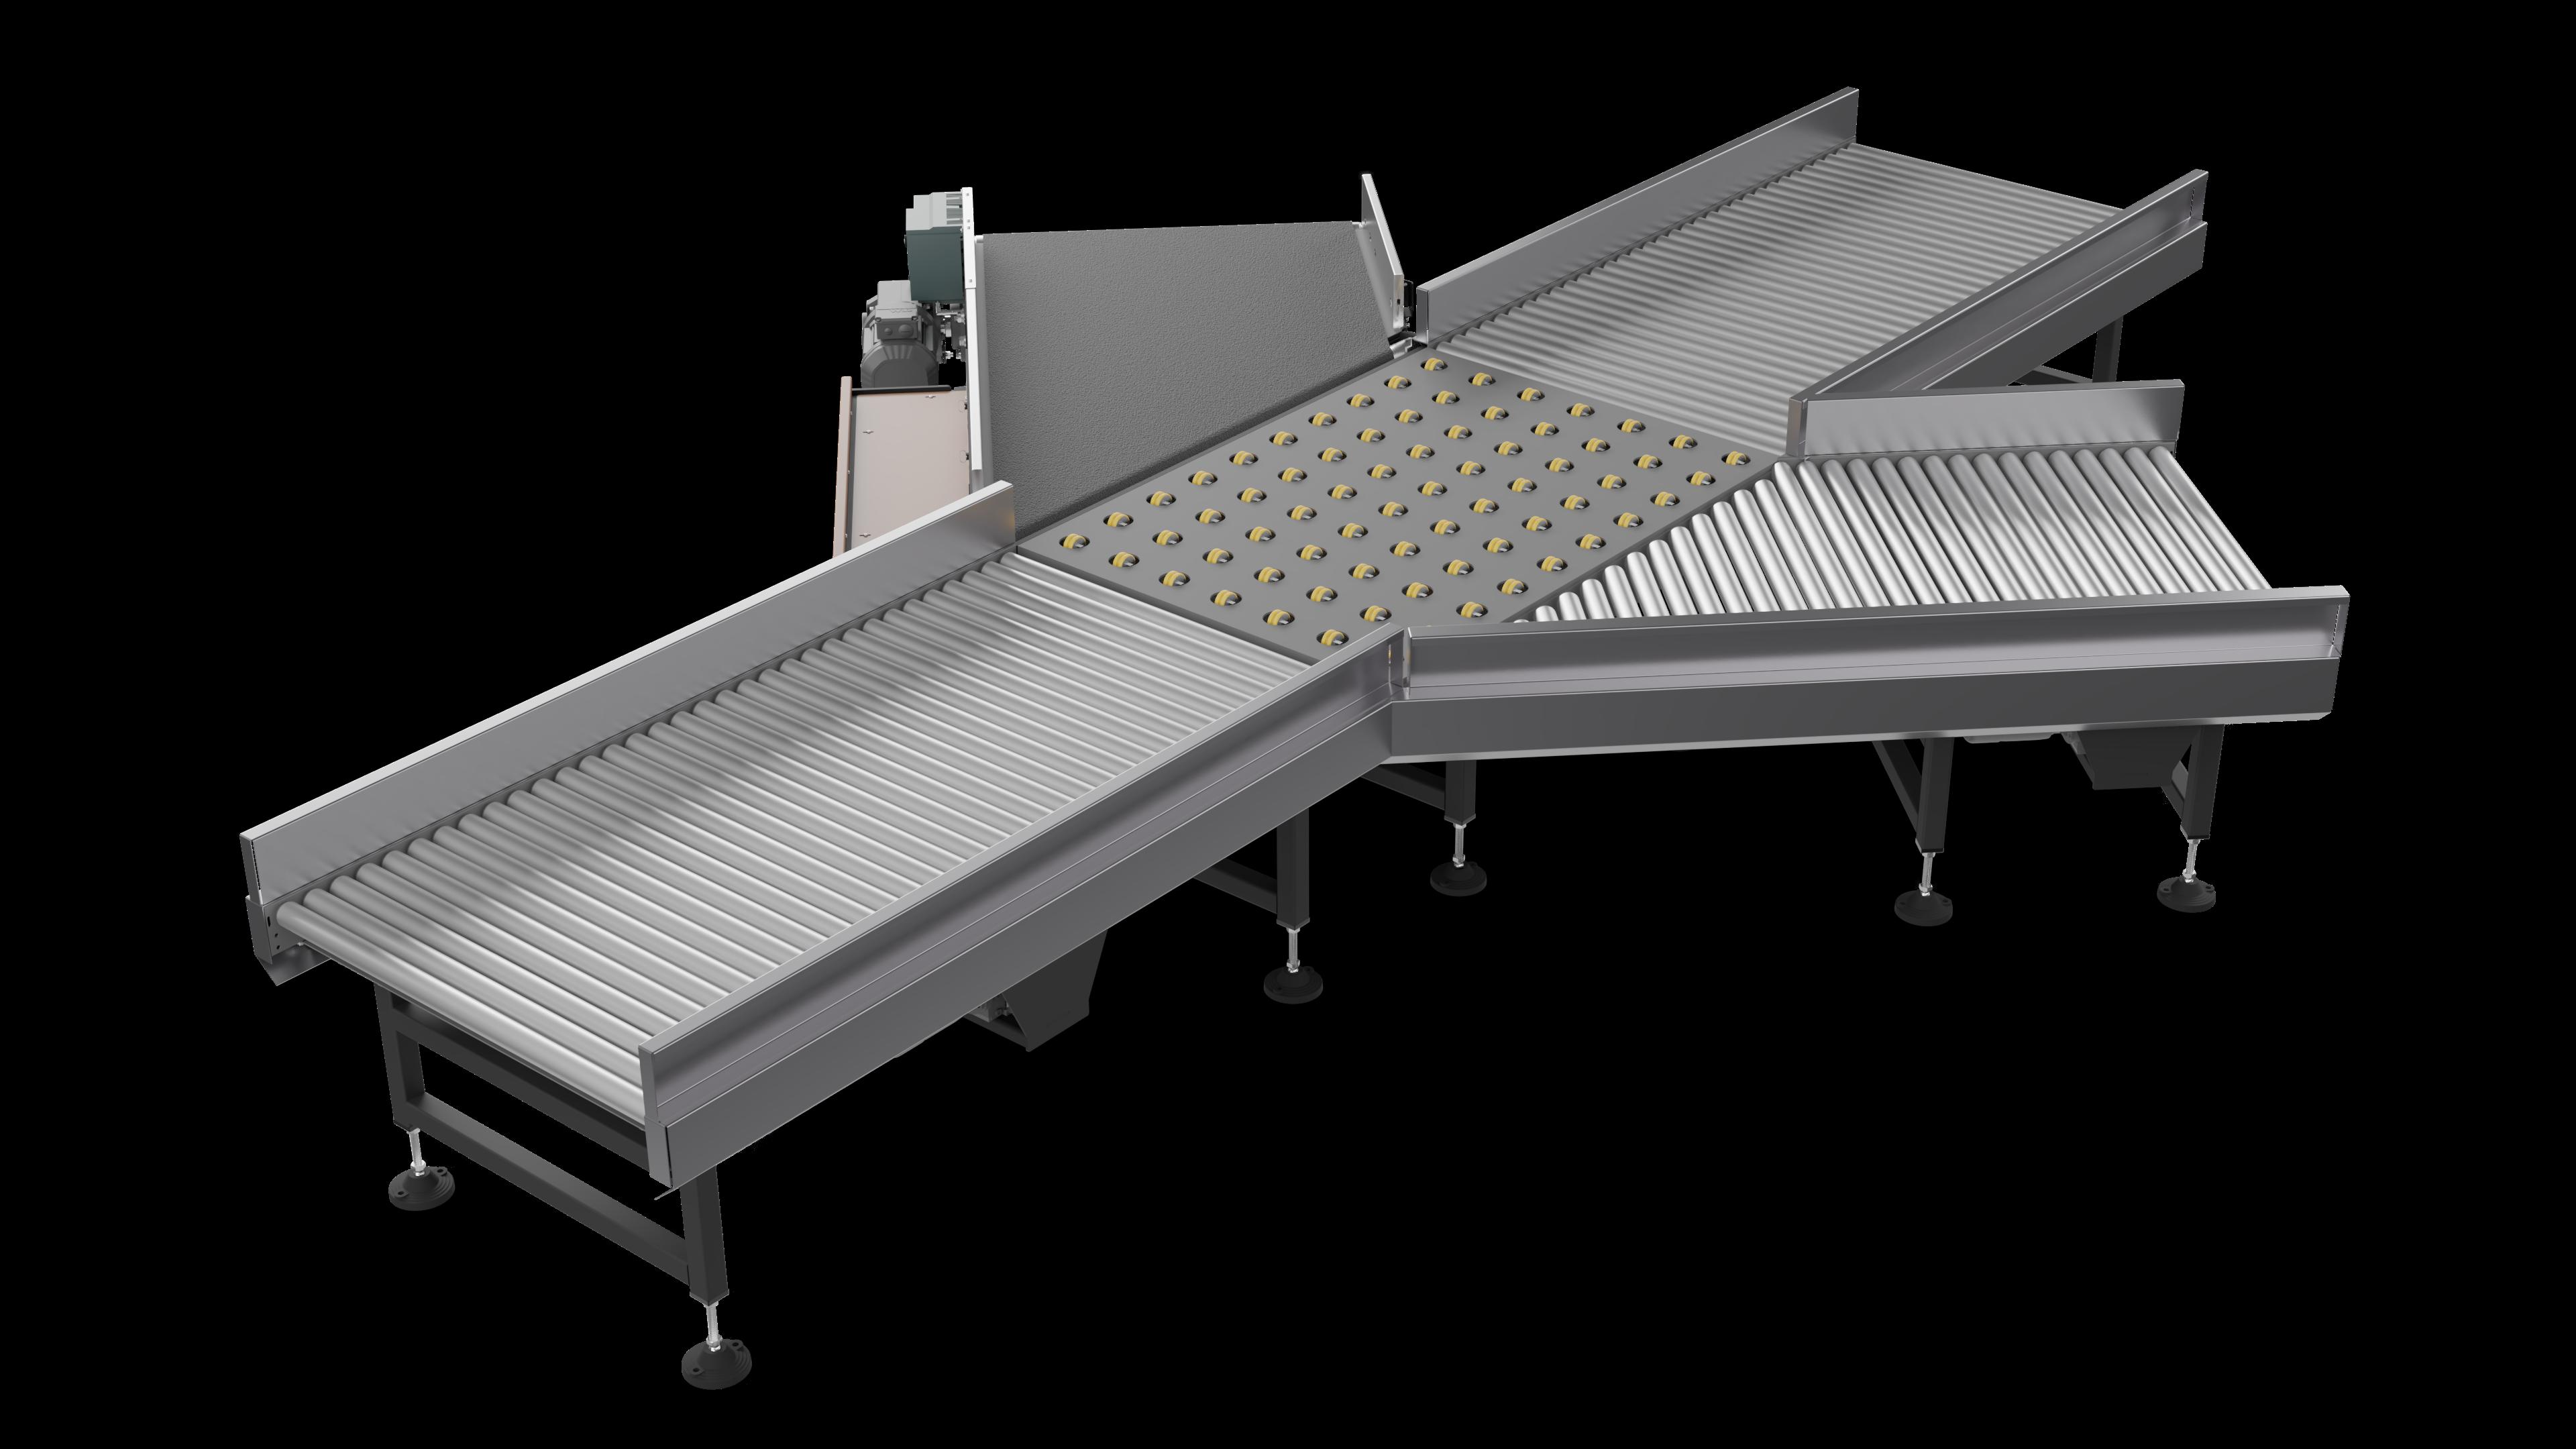 Horizontal distribution conveyor 001